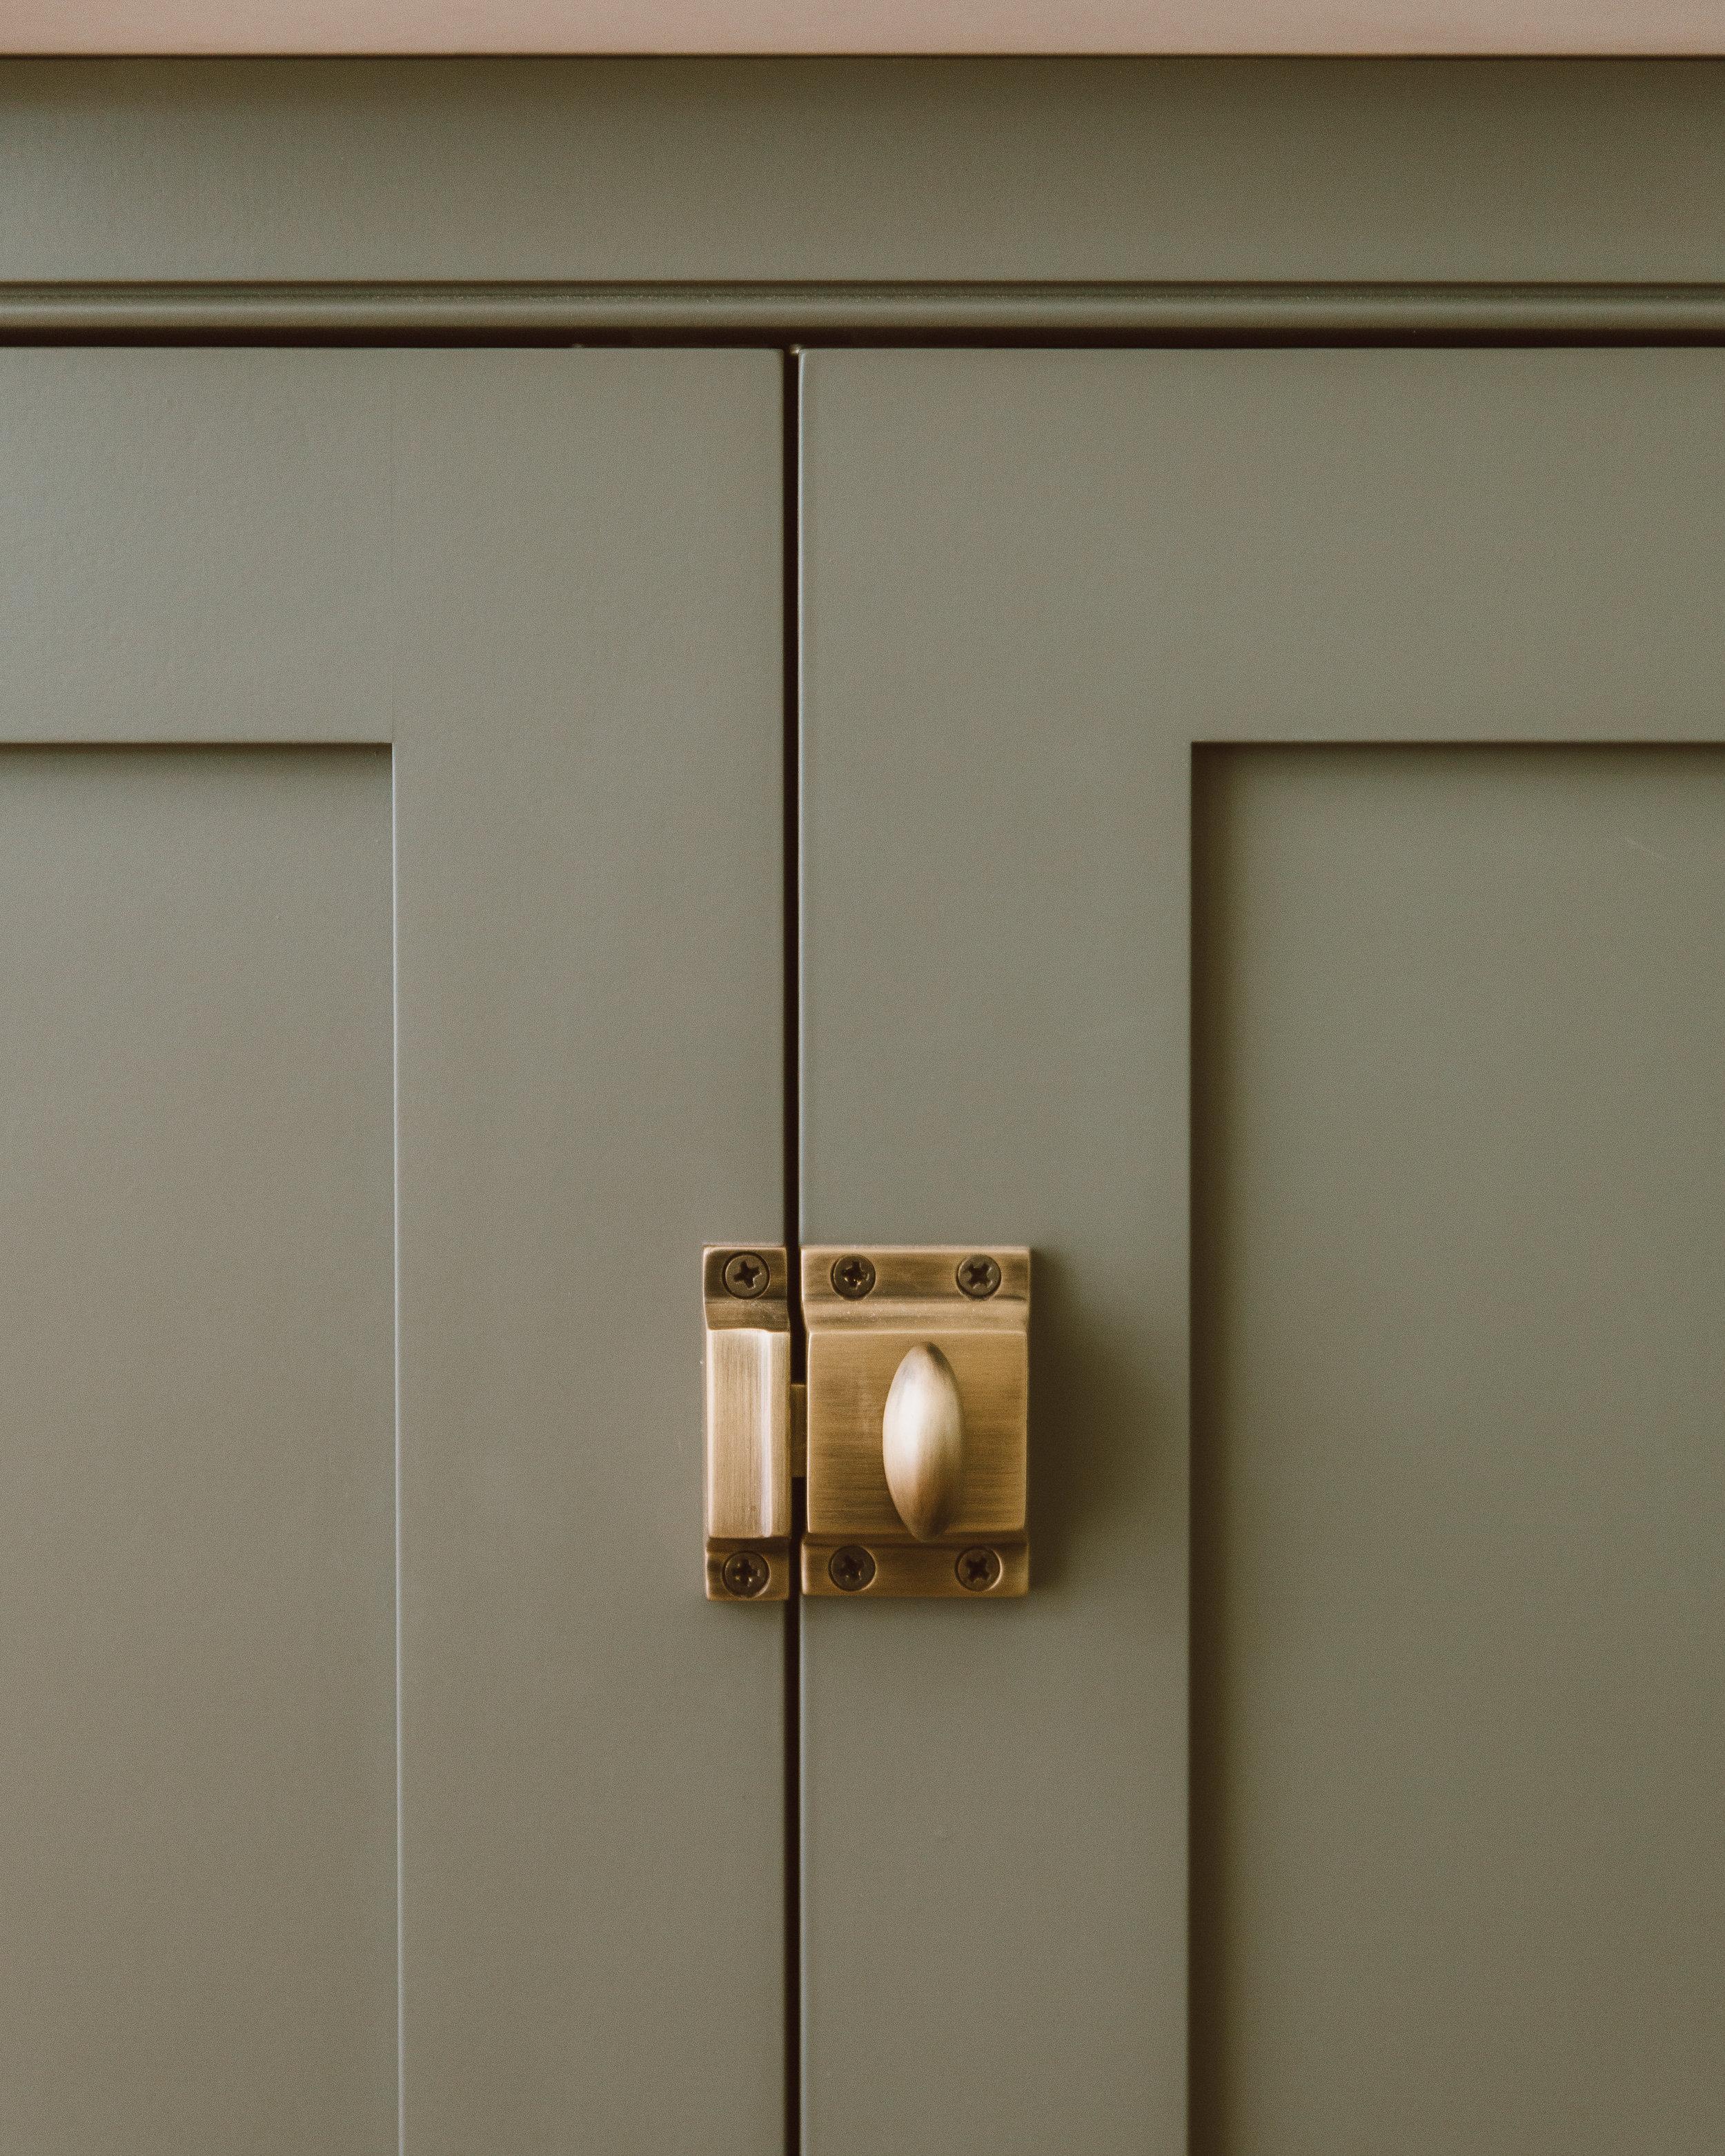 forthehome-nostalgic-warehouse-kitchen-cabinet-hardware04.jpg